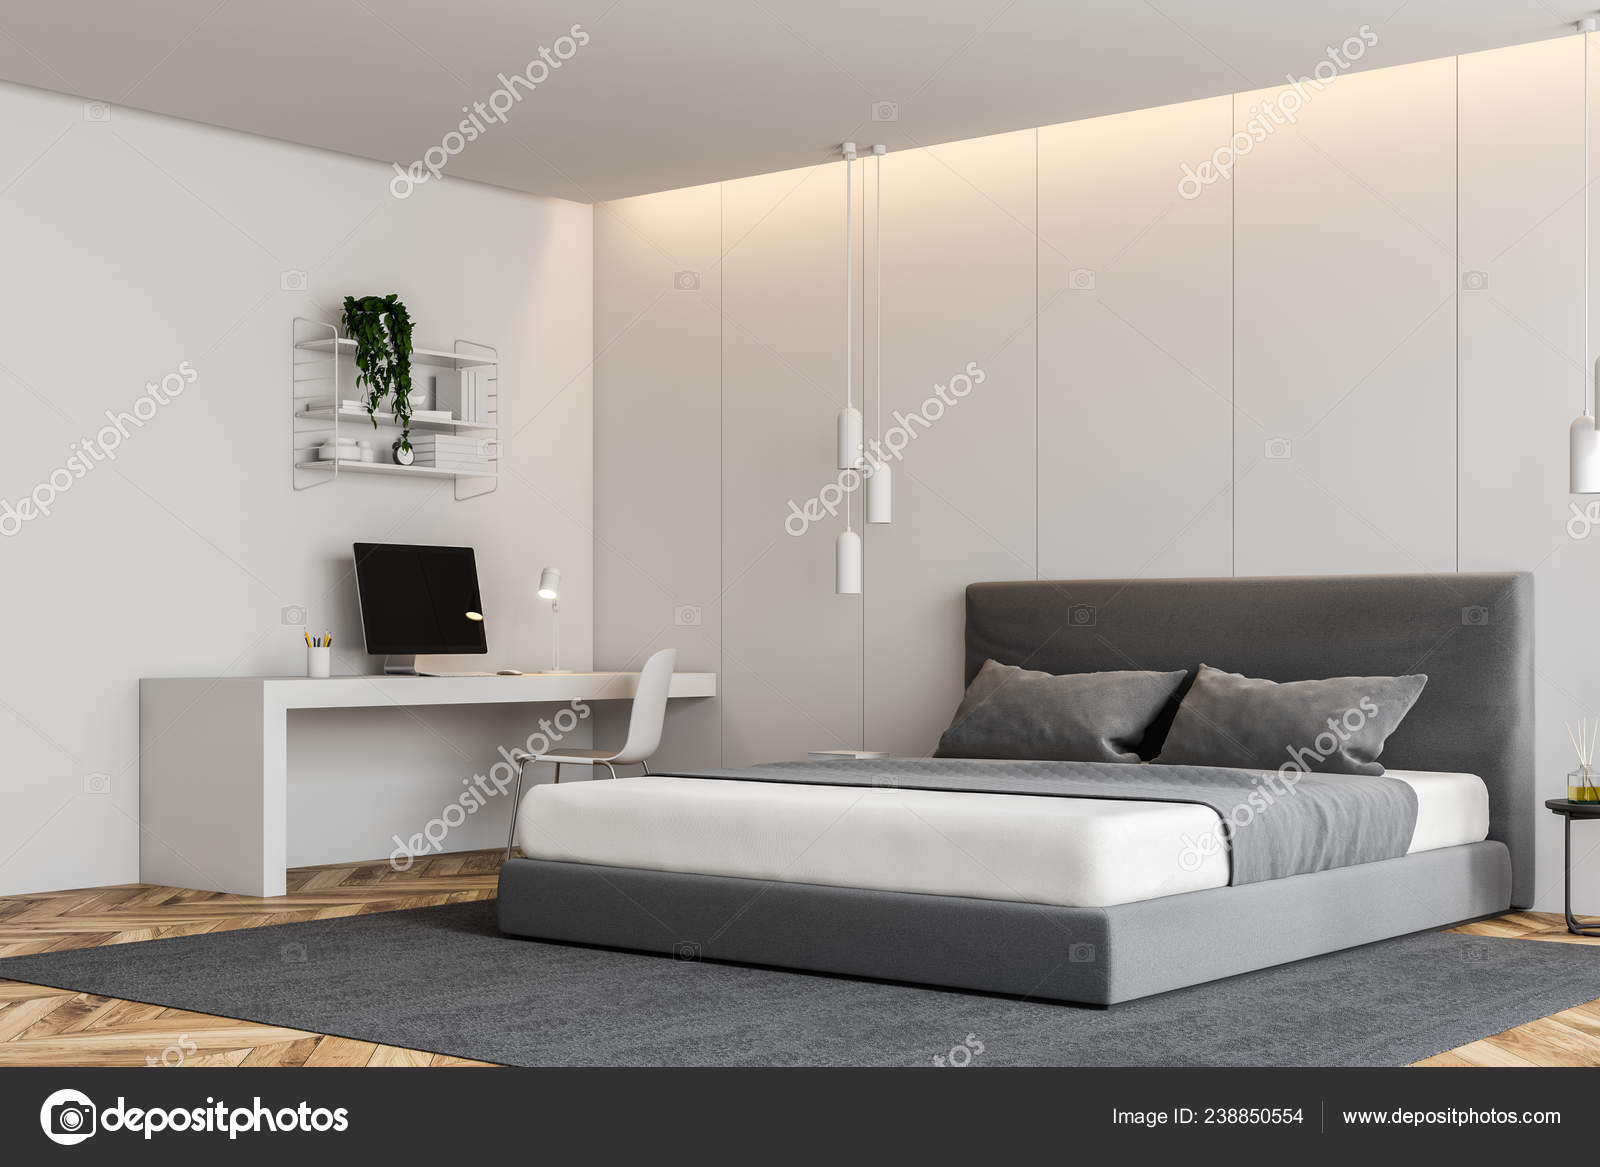 Corner Modern Bedroom White Walls Wooden Floor Gray Master Bed Stock Photo Image By C Denisismagilov 238850554